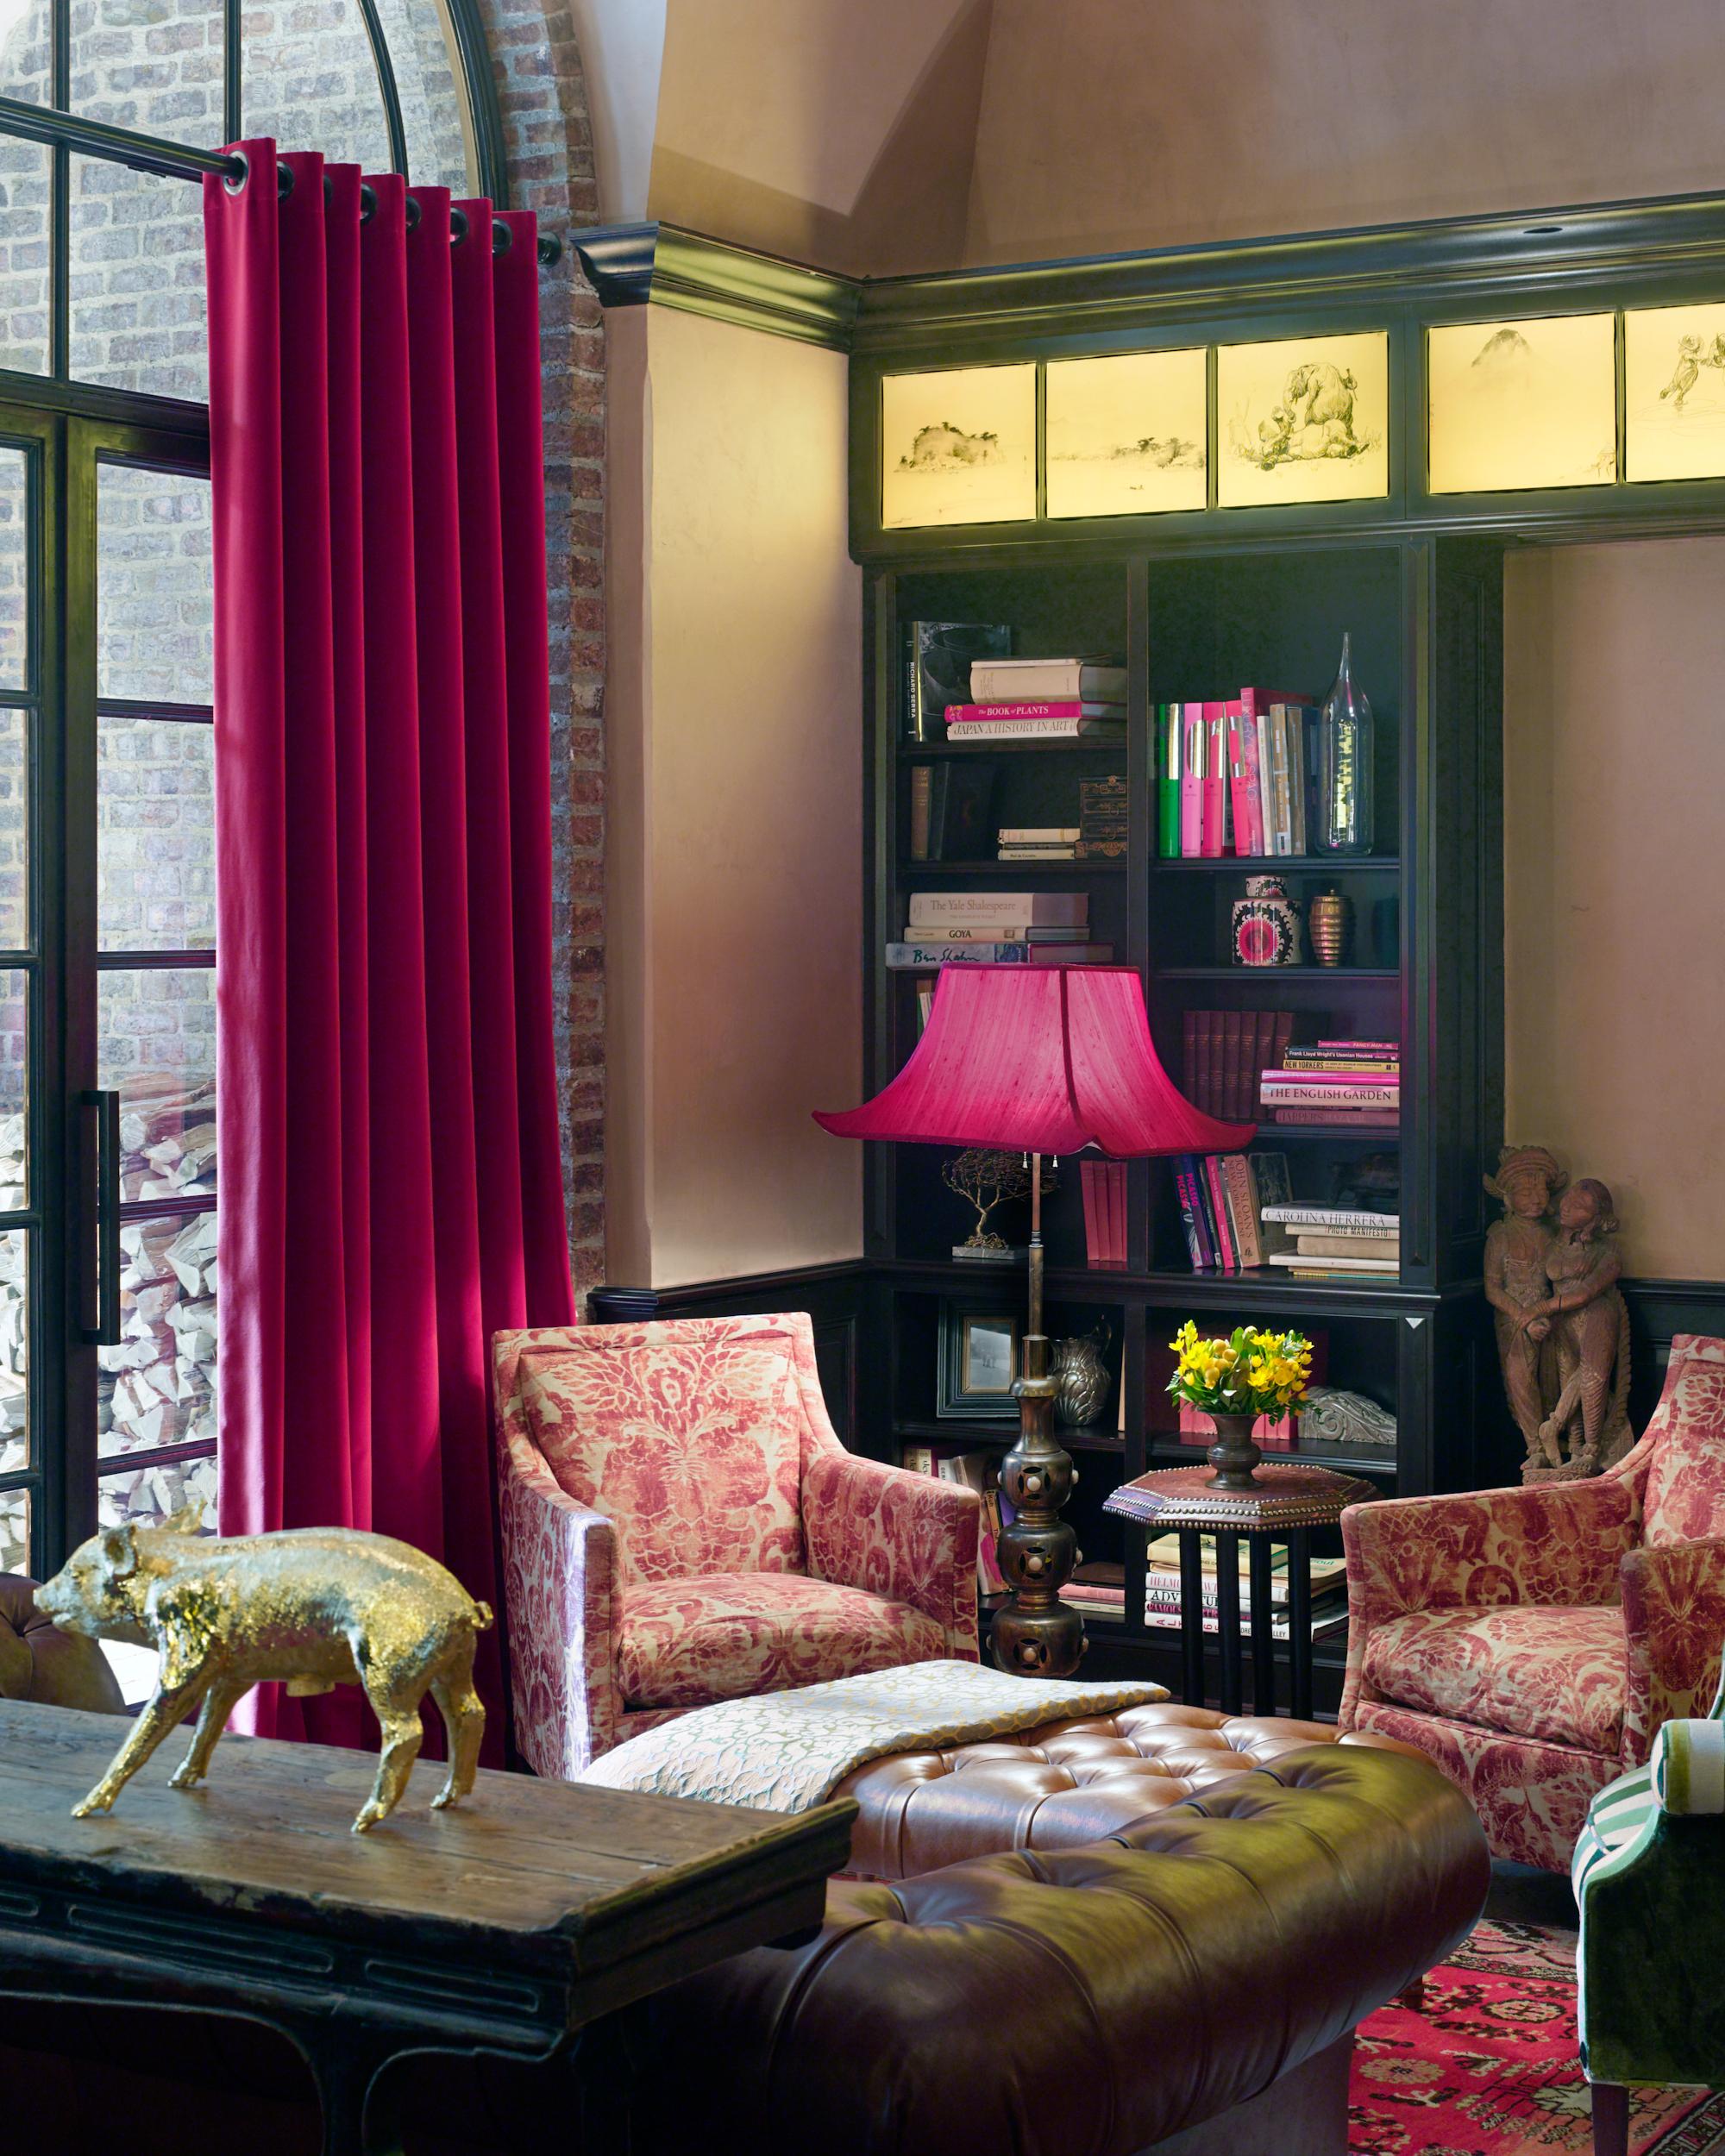 mrmrssmith-romantic-proposals-new-york-city-greenwich-hotel-1014.jpg